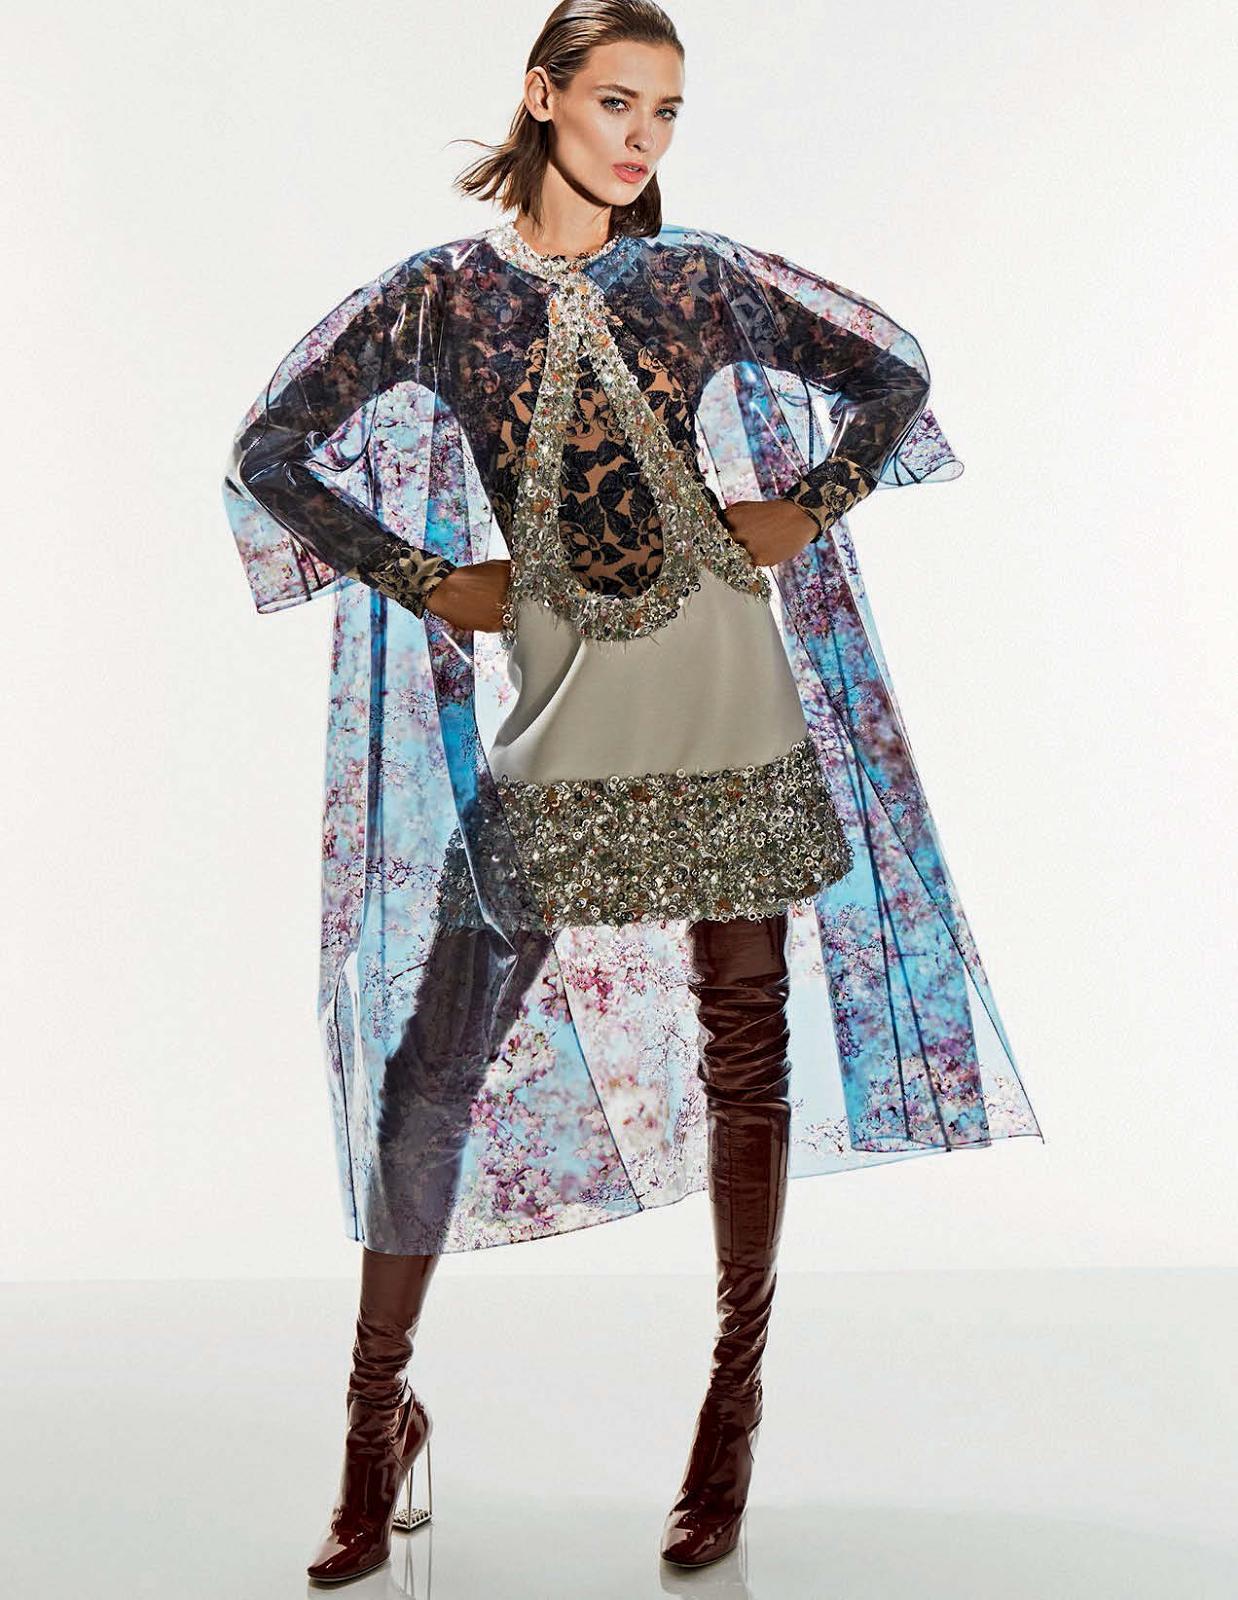 visual optimism; fashion editorials, shows, campaigns & more!: alto fragile: alexandra martynova and carolina thaler by mark pillai for elle italia april 2015